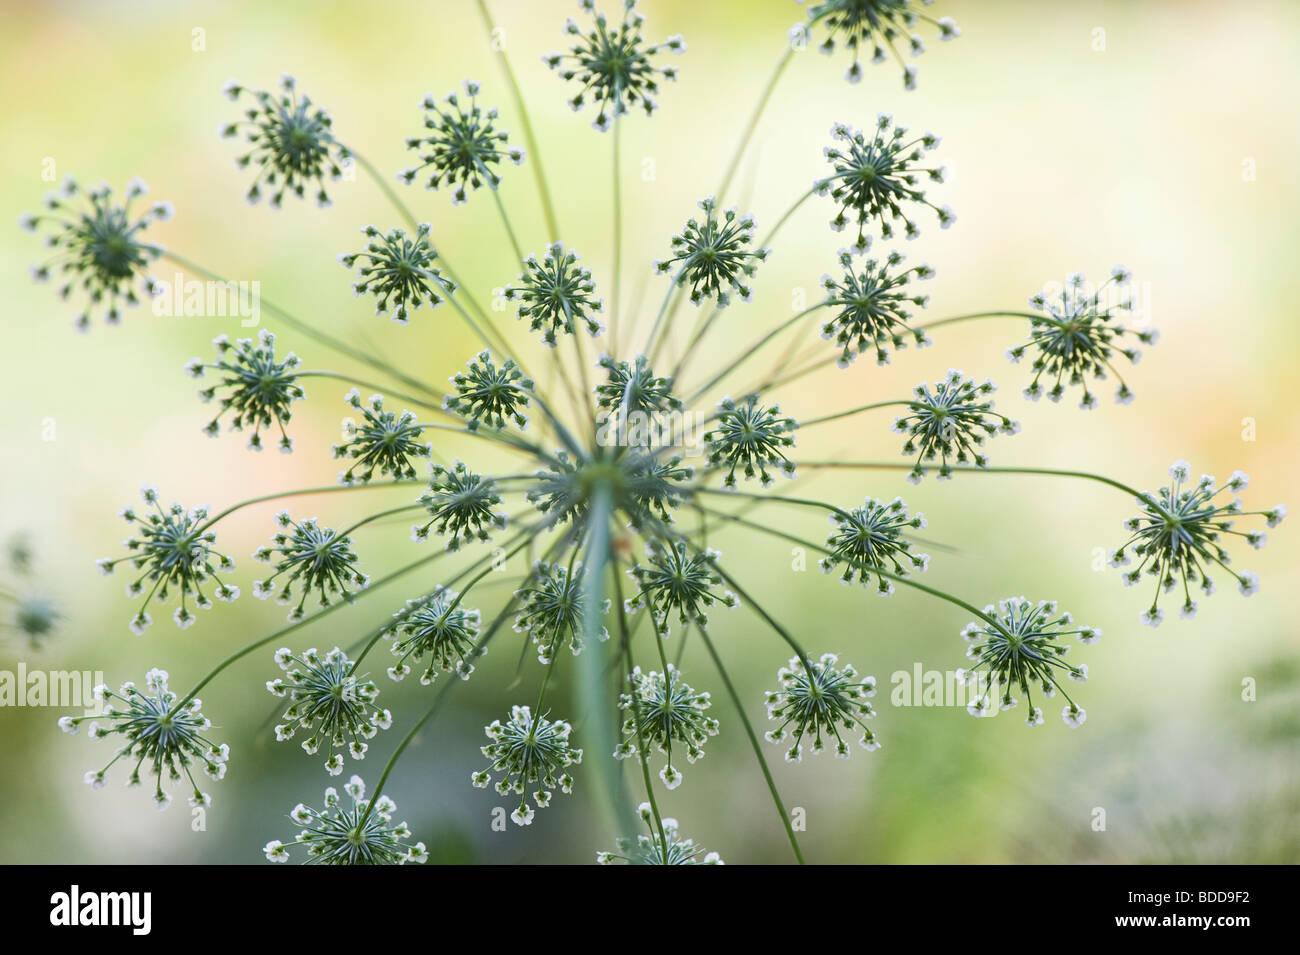 Ammi majus. Bullwort / Bishops weed flowering pattern - Stock Image